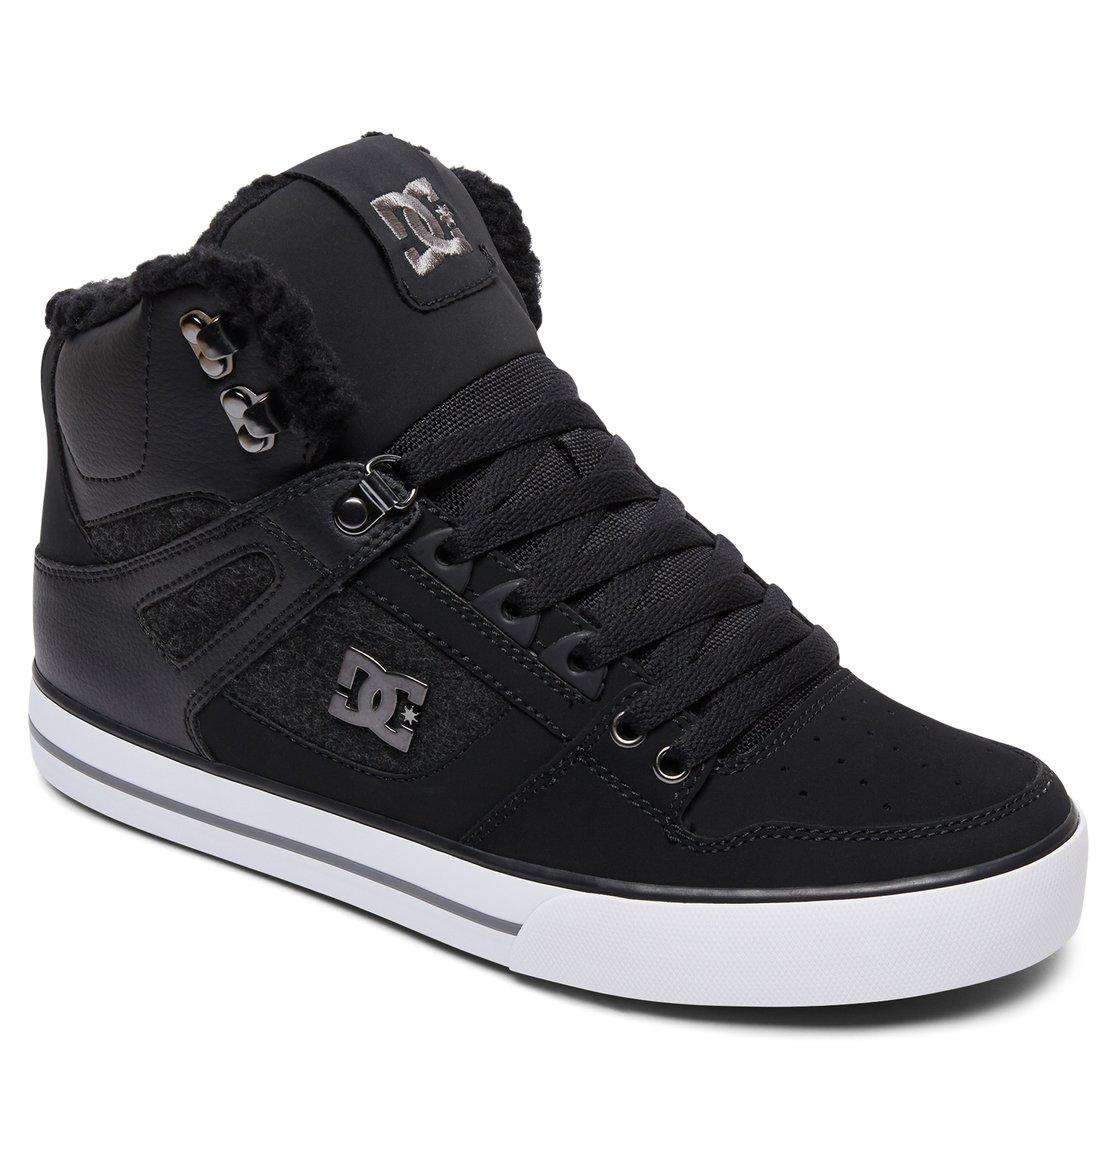 dc shoes Pure SE - Scarpe alte da Uomo - Black - DC Shoes dKnV15ML